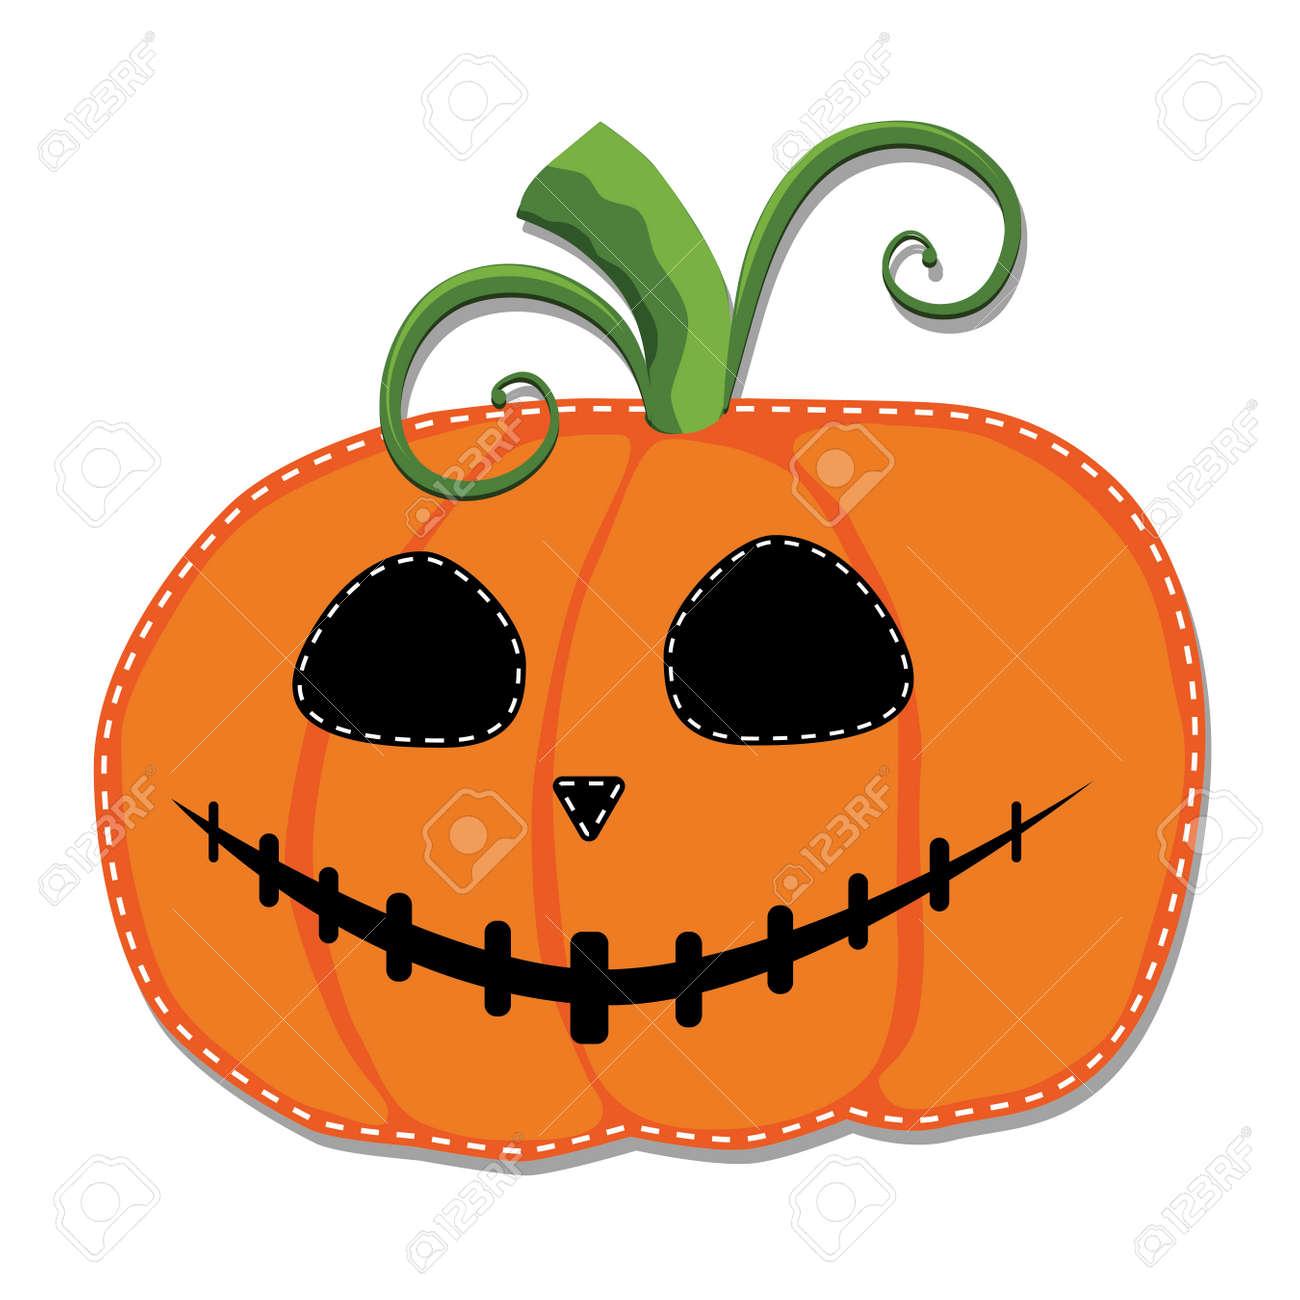 jack o lantern or carved pumpkin on a transparent background royalty rh 123rf com Halloween Clip Art Halloween Clip Art